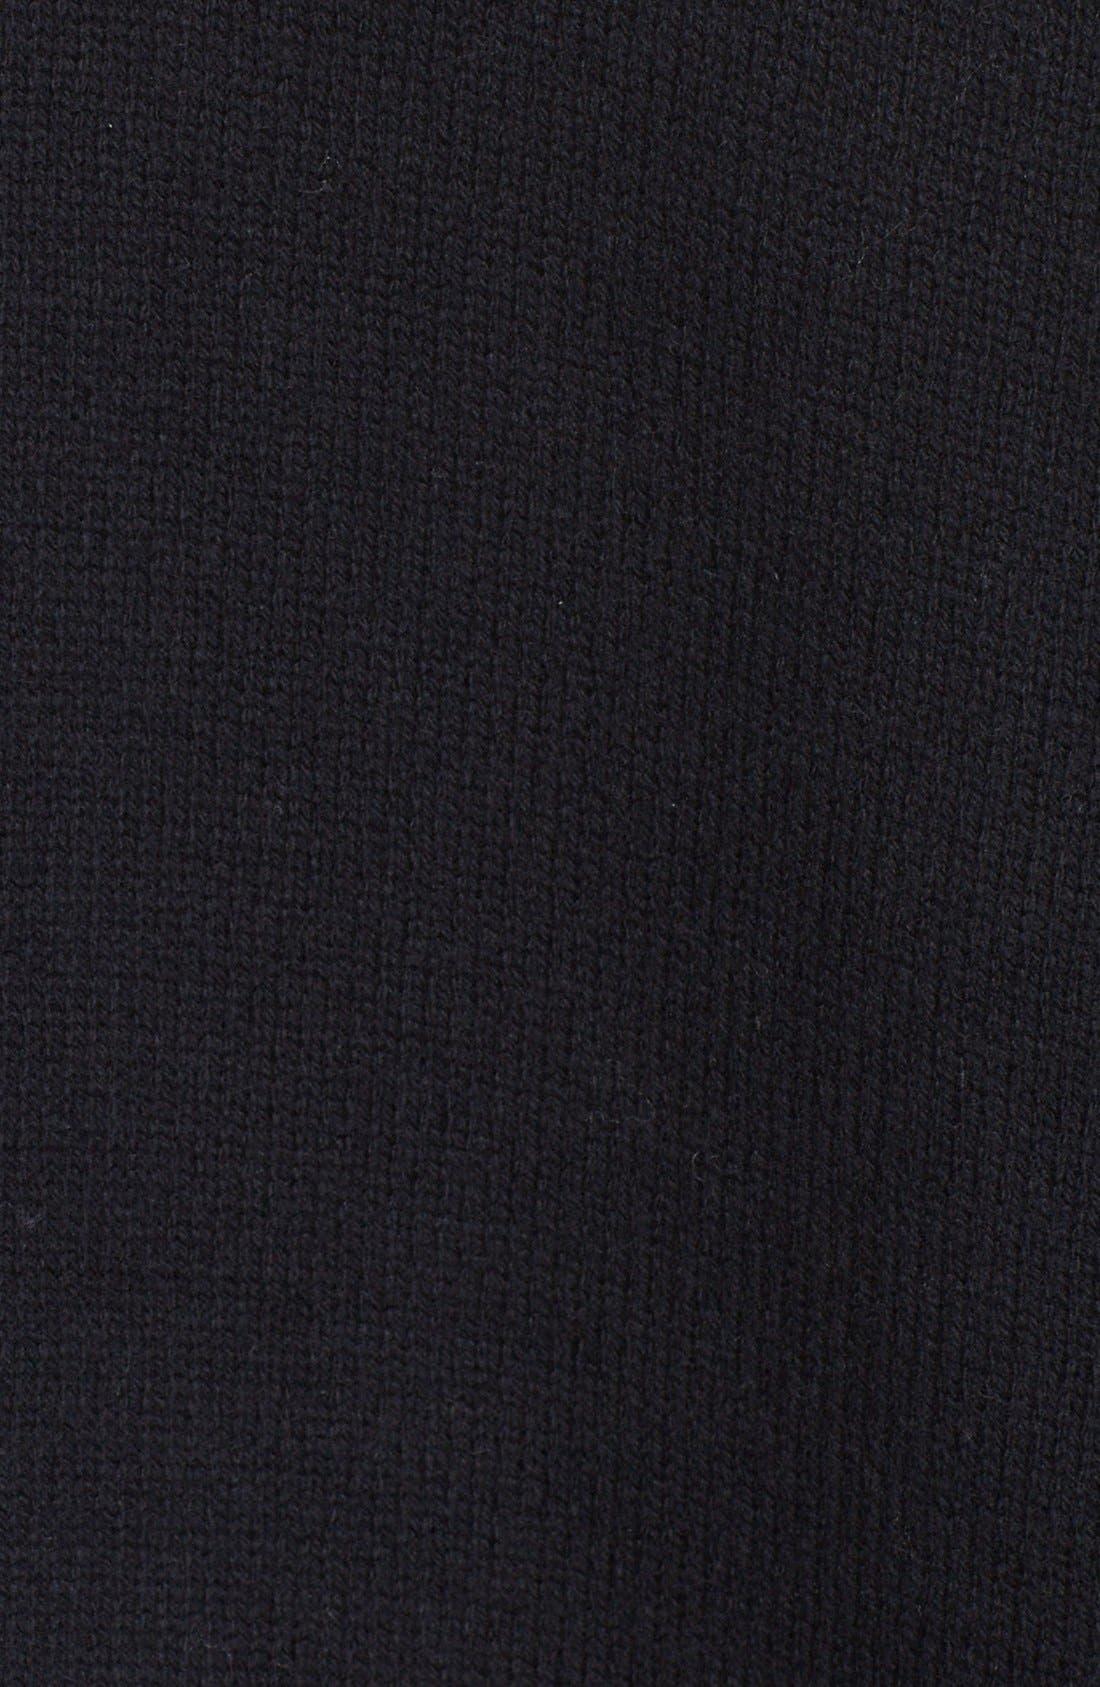 Side Slit Wool & Cashmere Cardigan,                             Alternate thumbnail 2, color,                             001